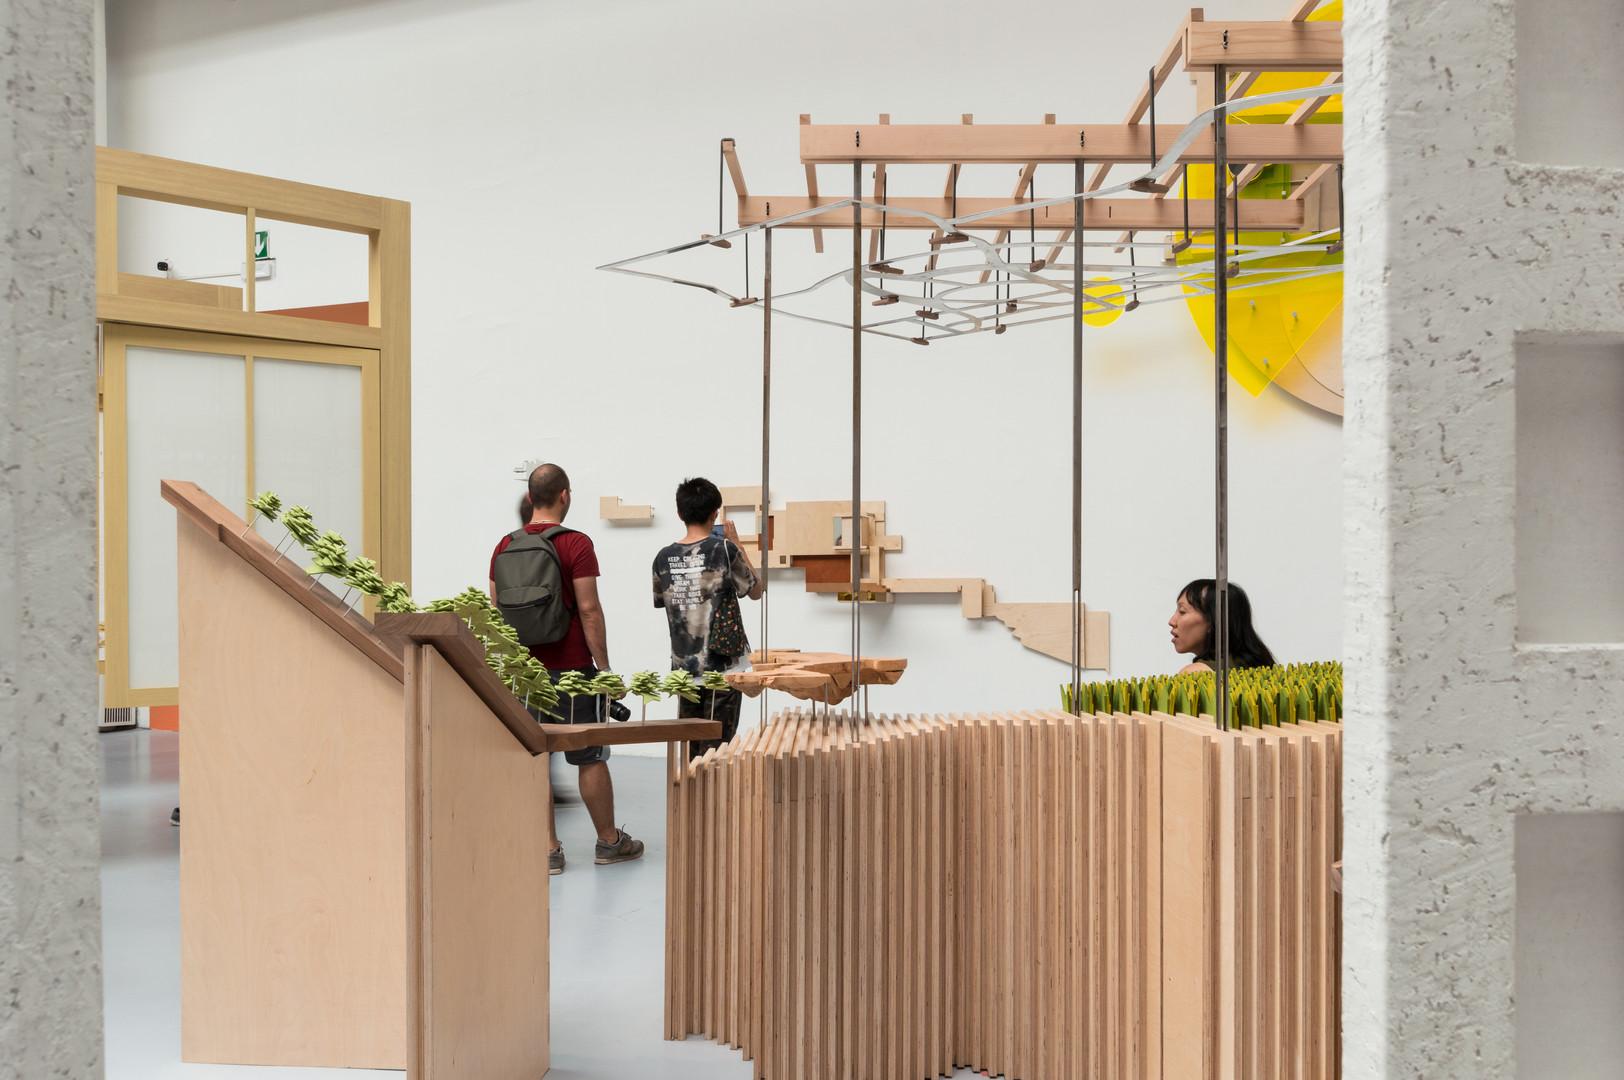 Pavilion by Bucholz McEvoy Architects at the Venice Biennale 2018